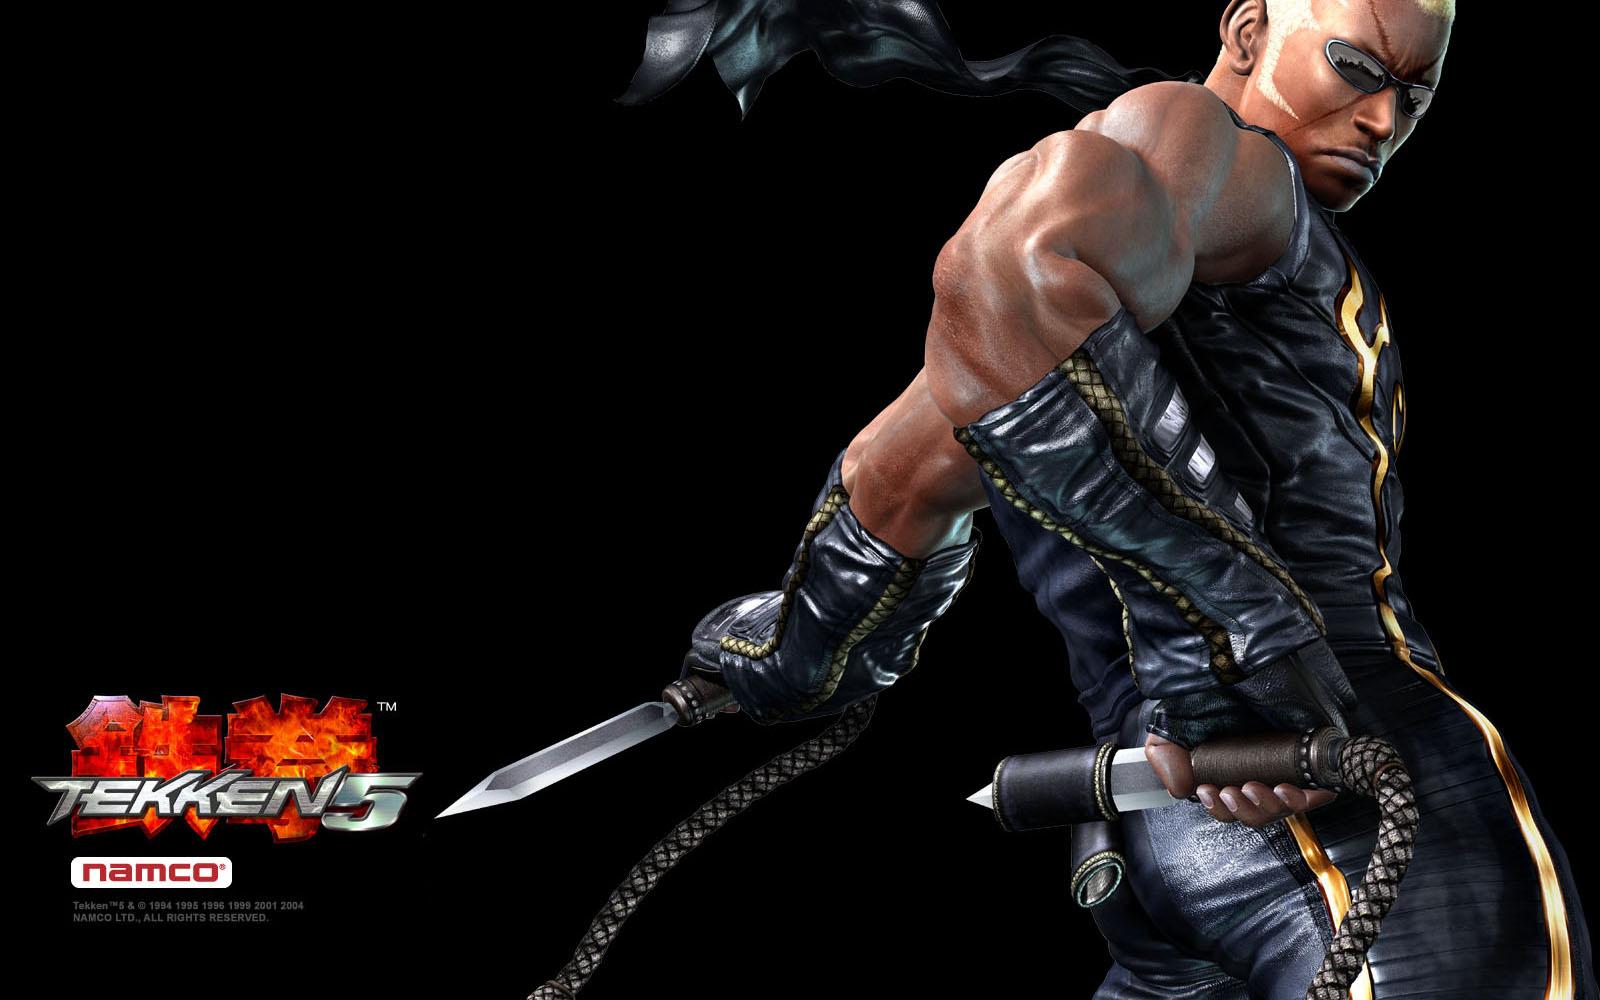 http://www.fightersgeneration.com/characters3/raven-t5x.jpg